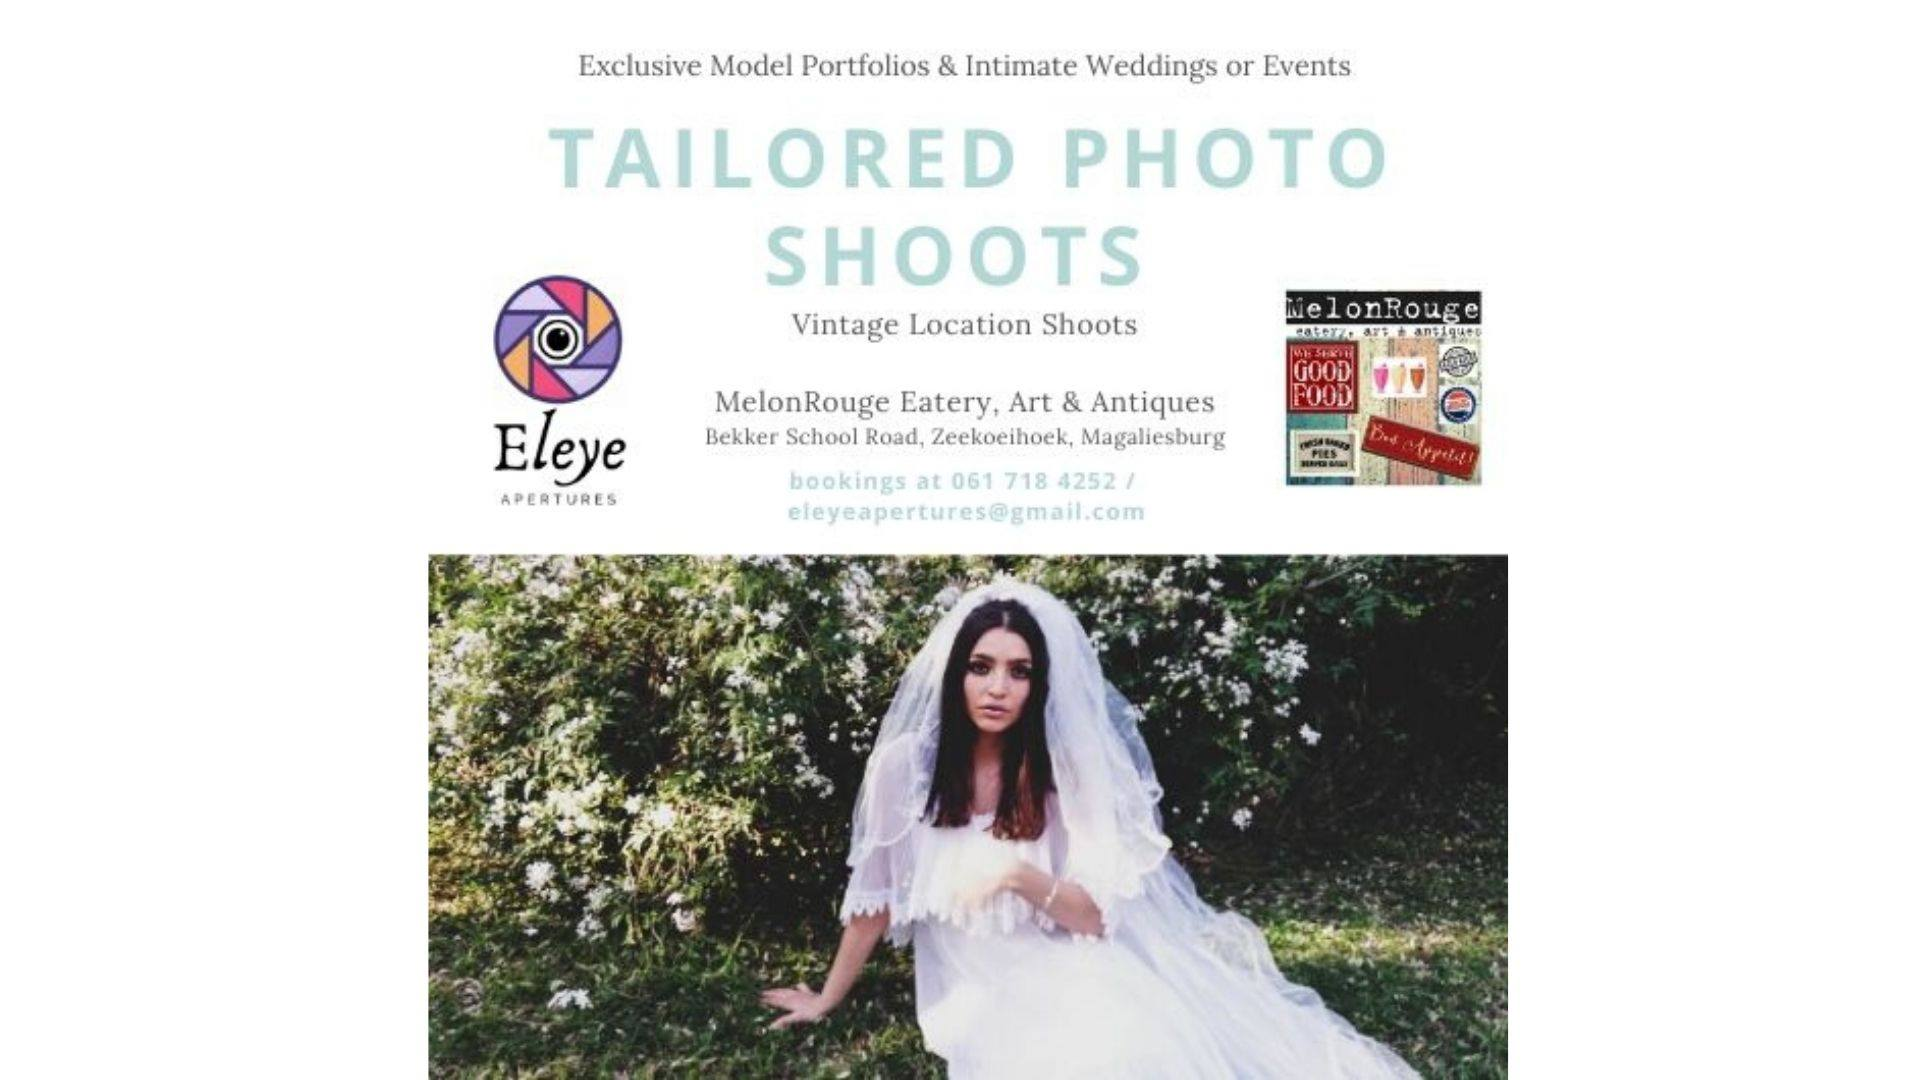 Tailored Photo Shoots